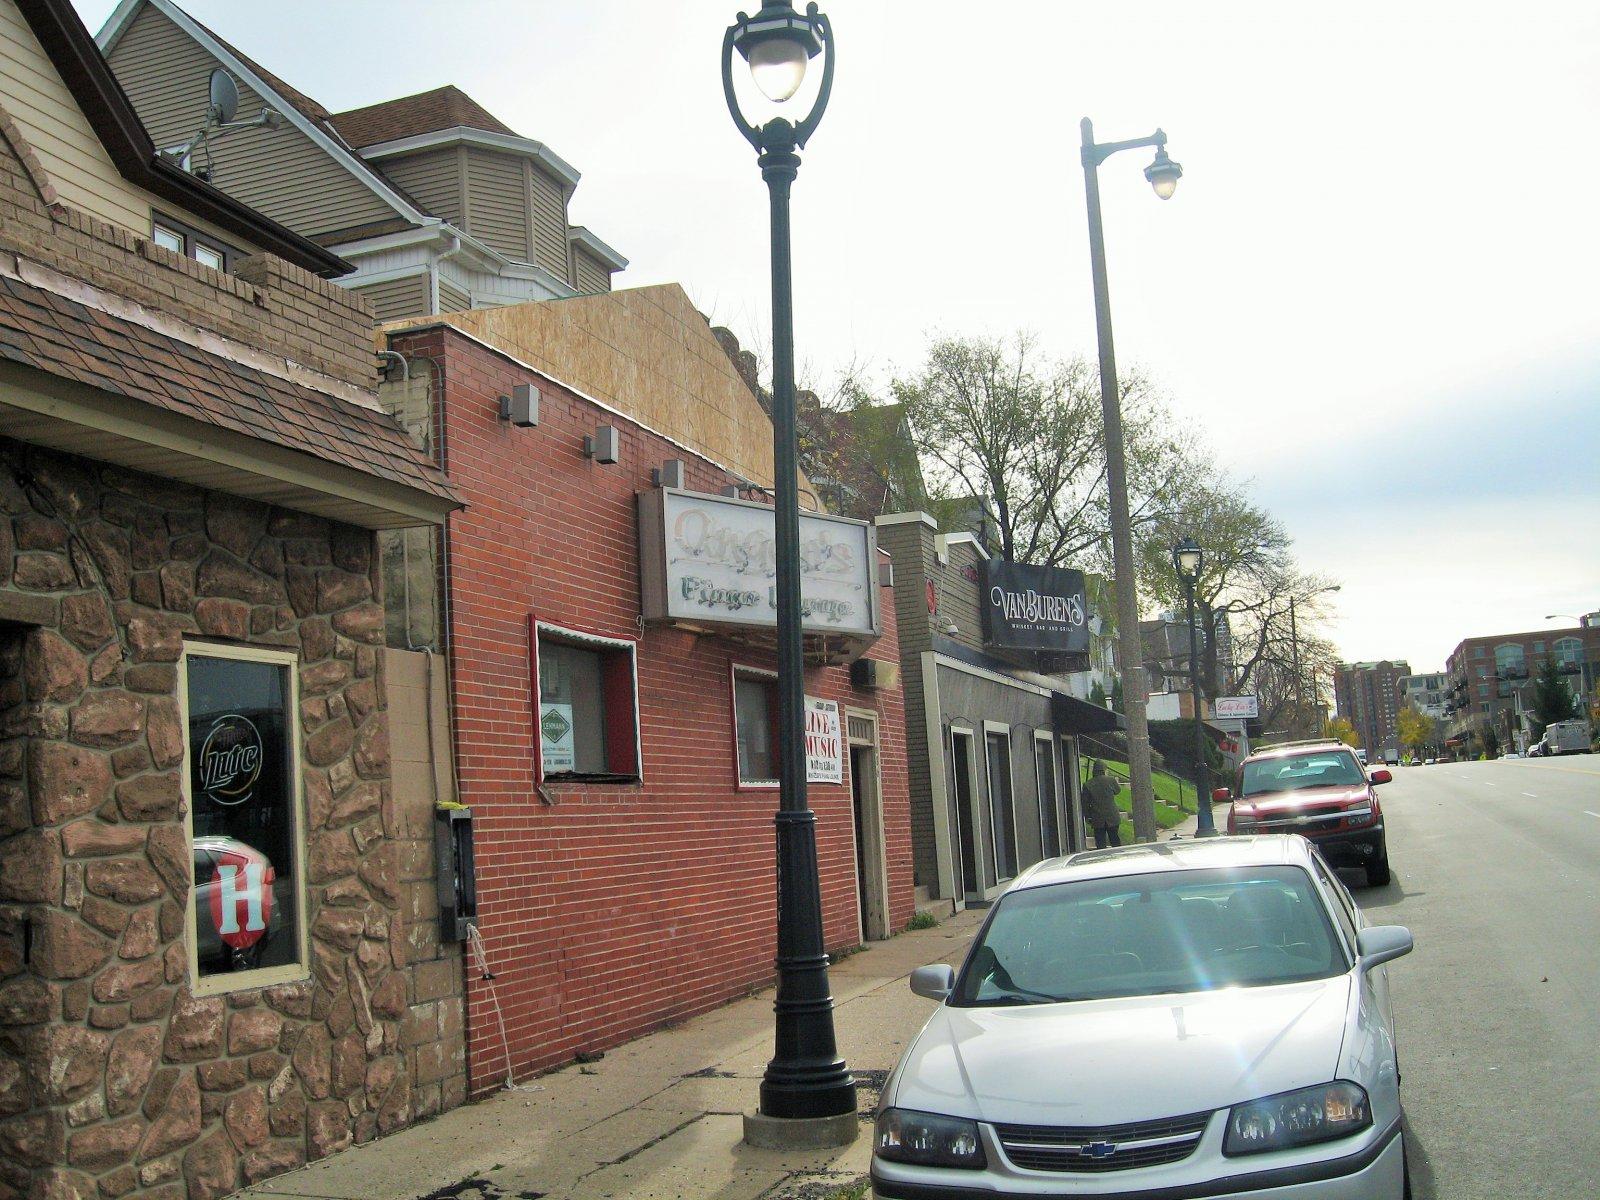 Angelo's Piano Lounge and Van Buren\'s Whiskey Bar